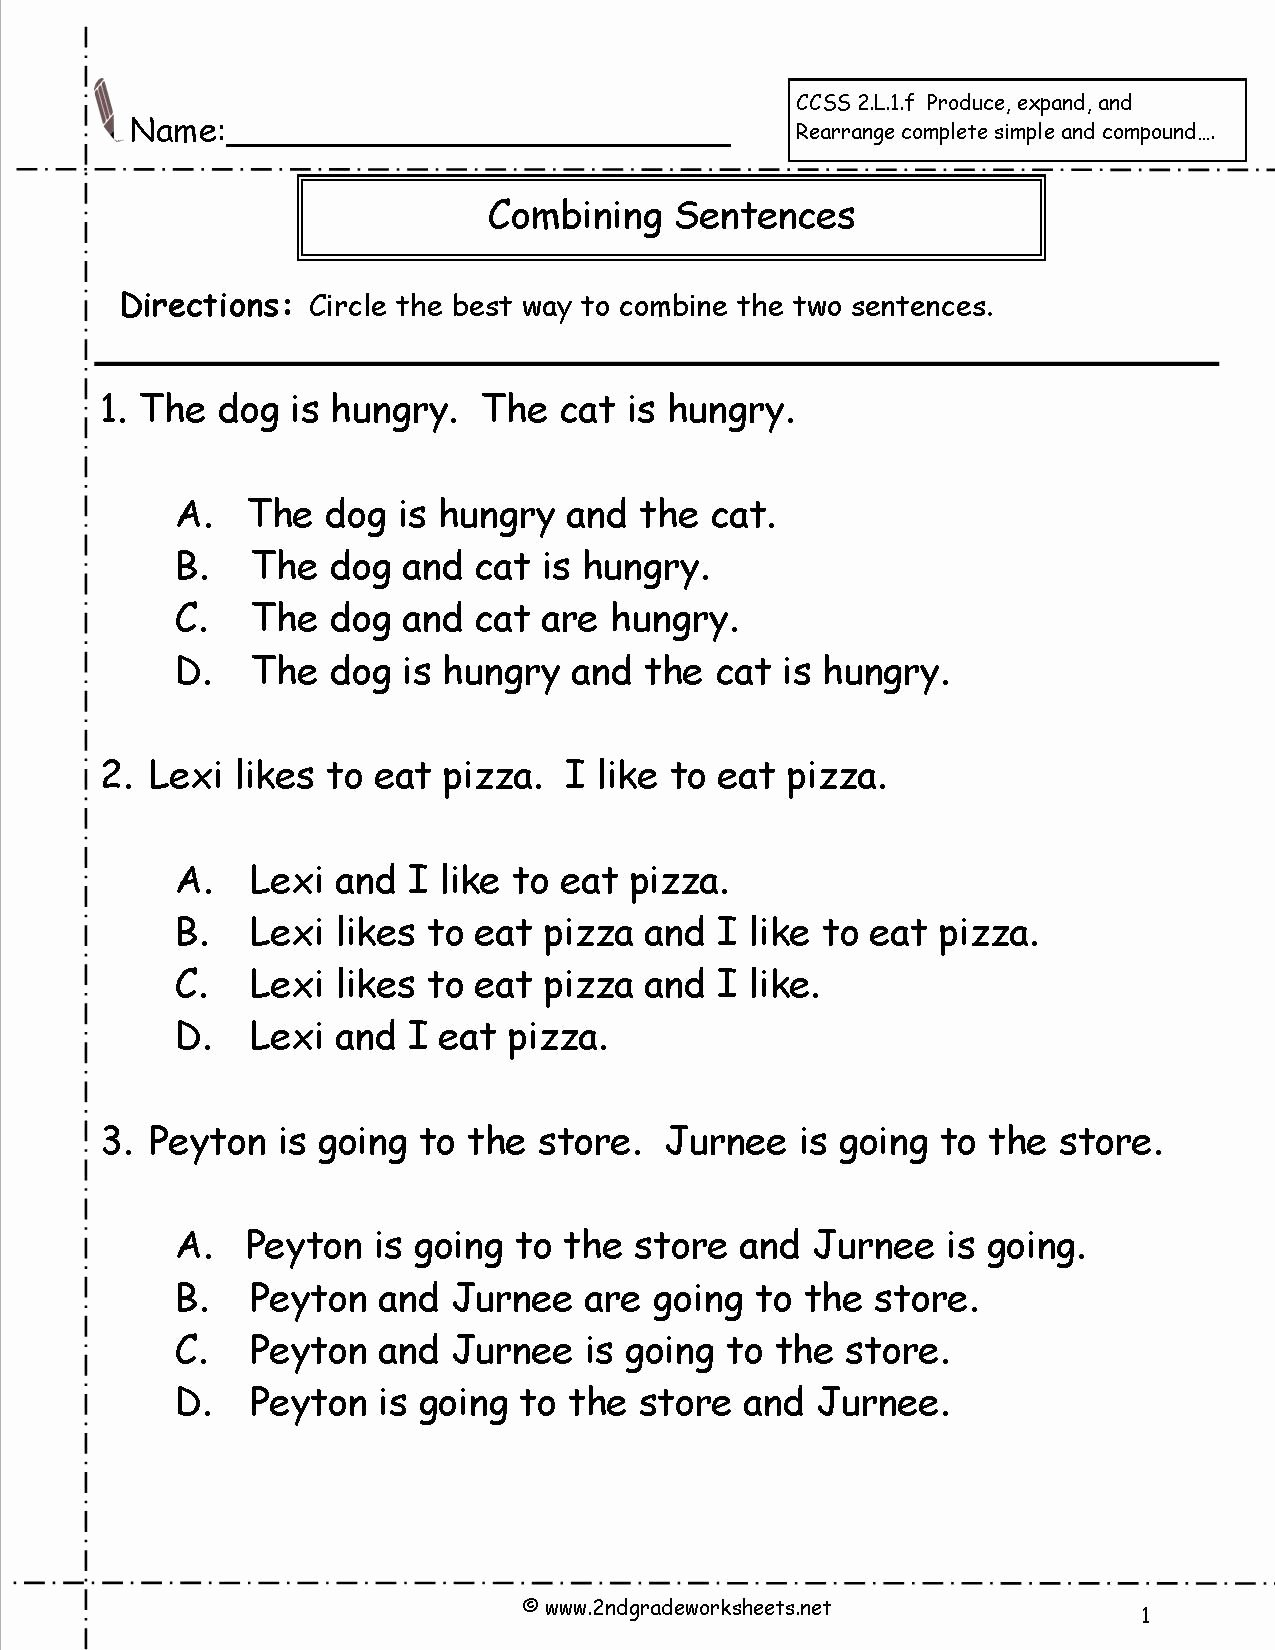 Combining Sentences Worksheet 5th Grade Kids Bining Sentences Worksheet